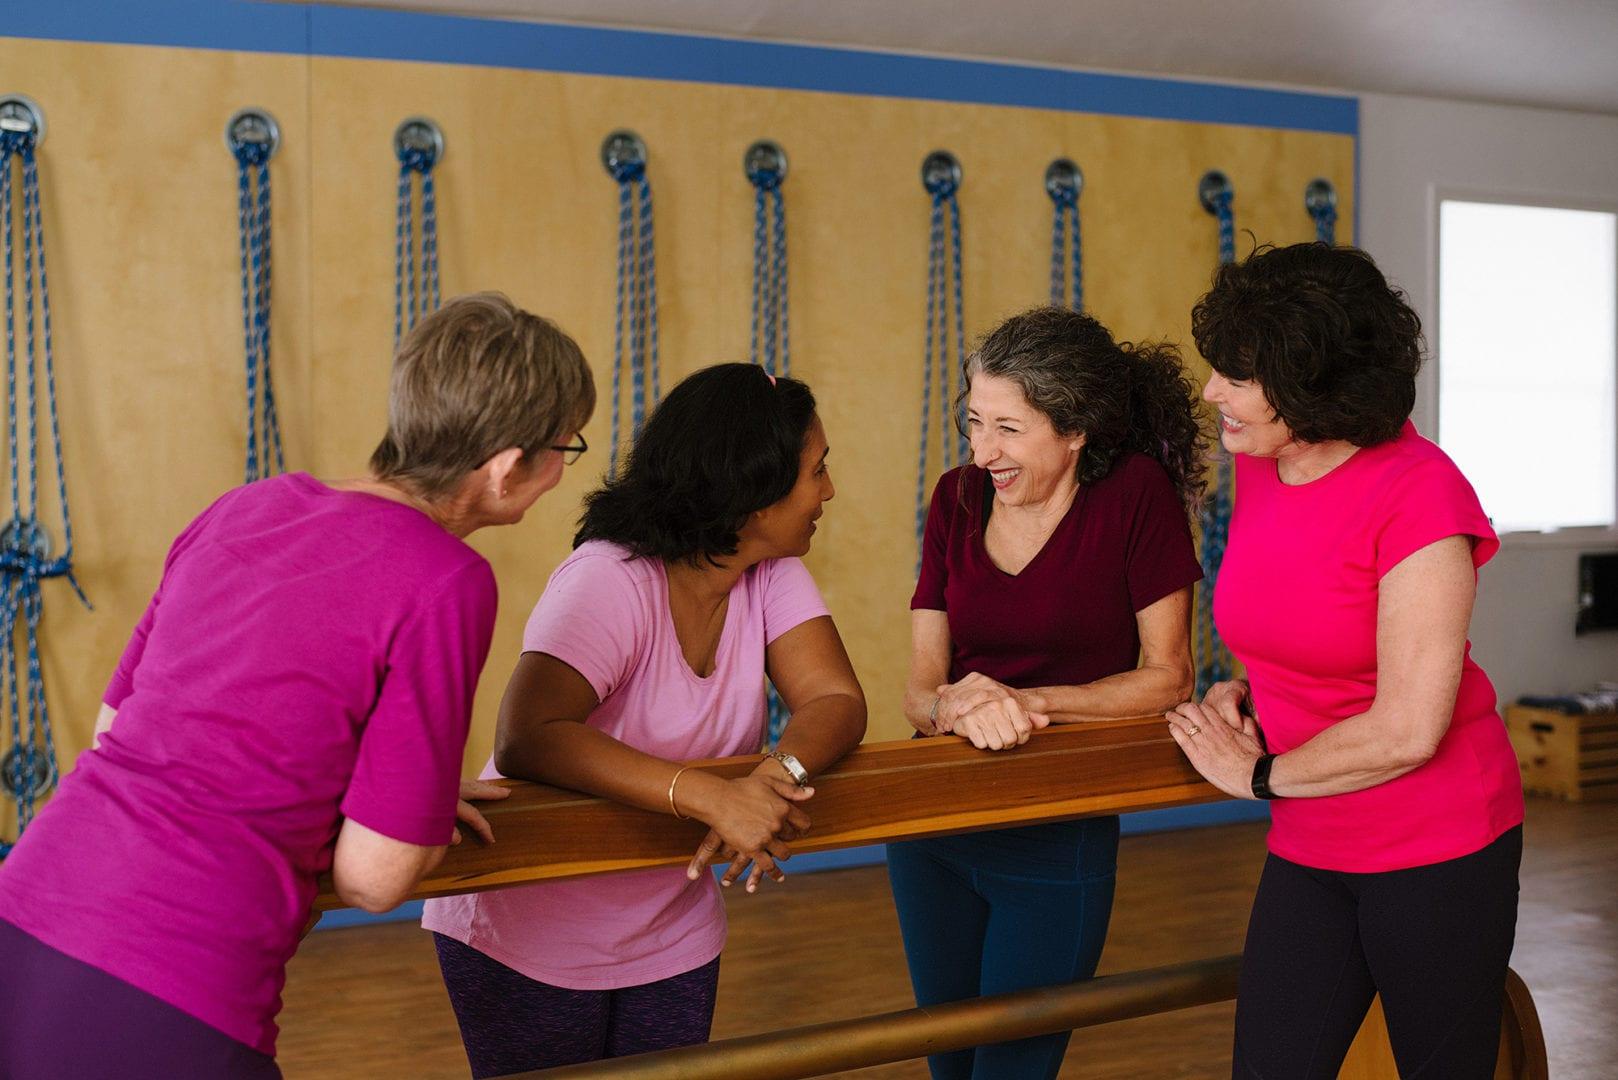 Iyengar Yoga Sarasota's Teachers Group Photo